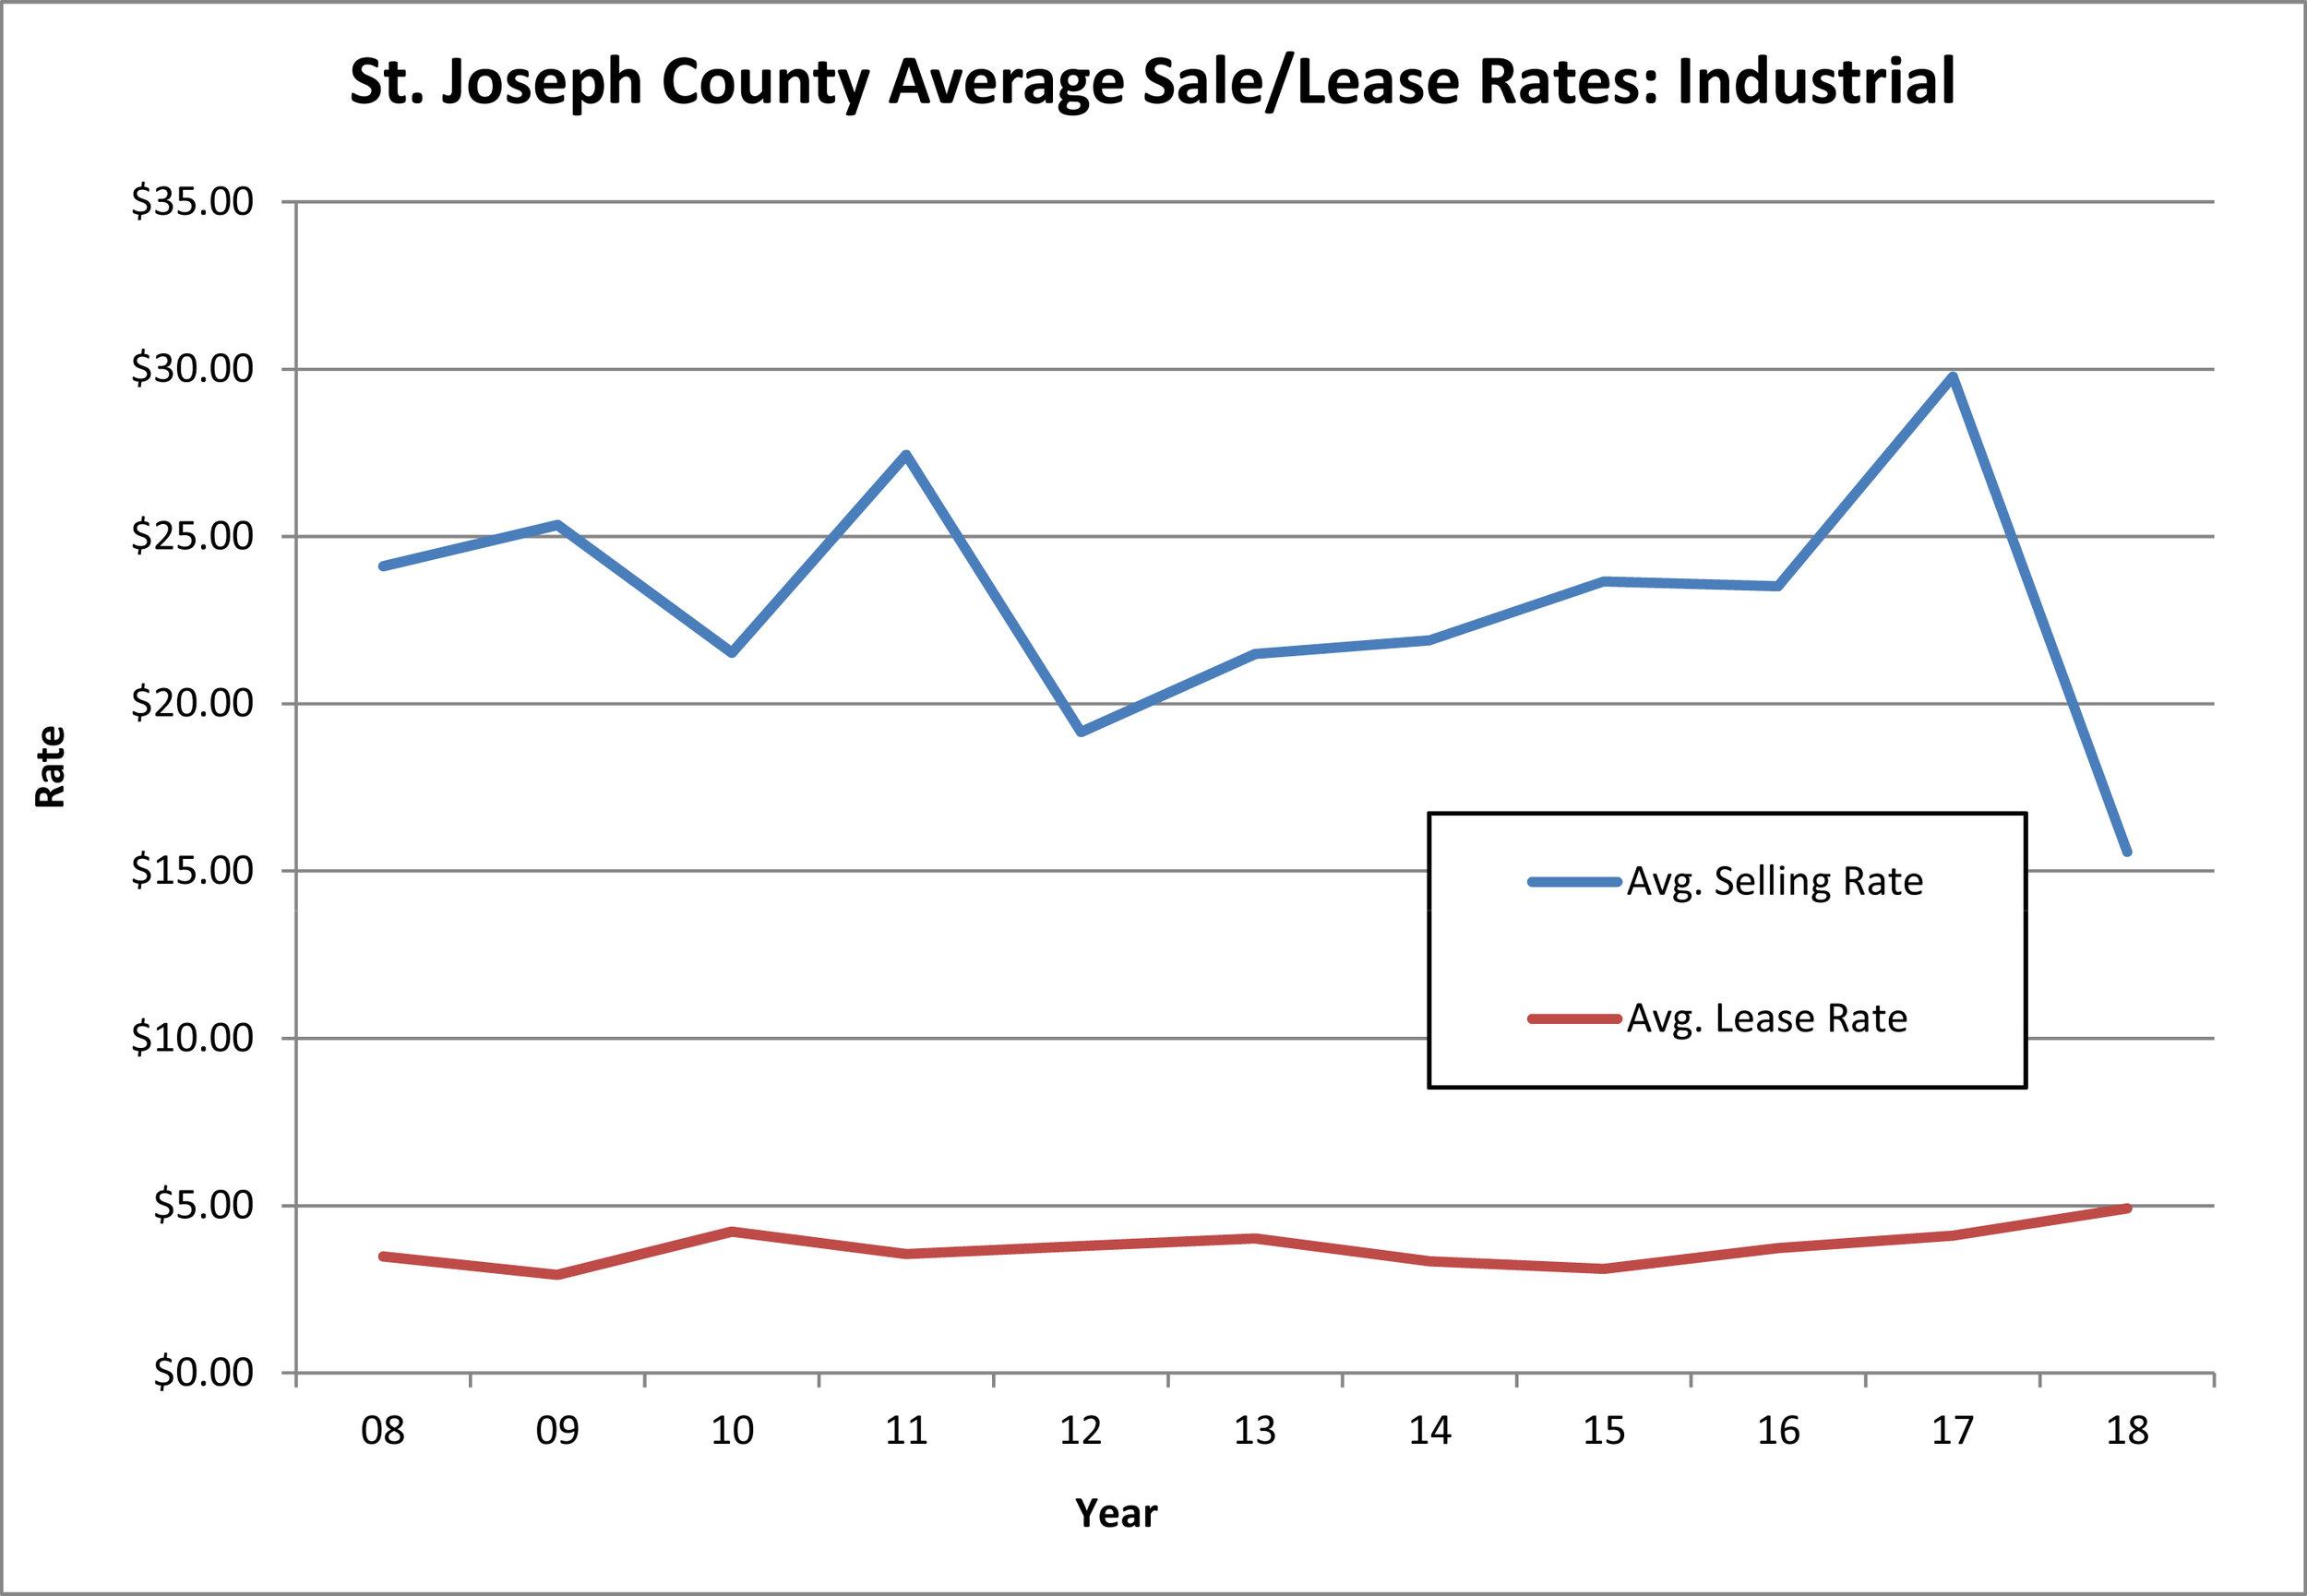 SJ-Co-2008-2019-Rates-Ind.jpg